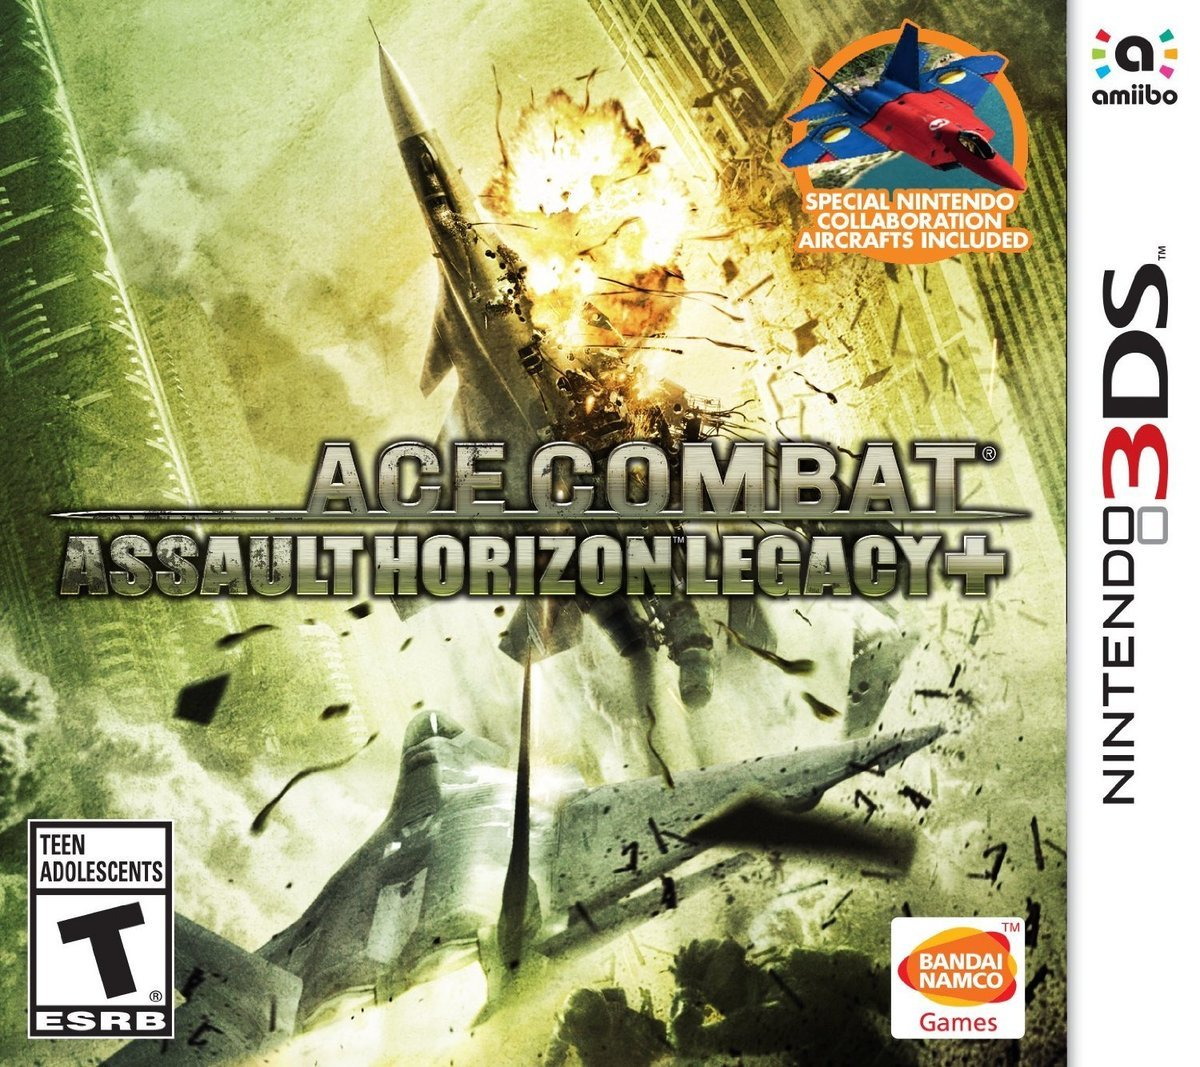 Namco Ace Combat Assault Horizon Legacy 3D Nintendo 3DS Games